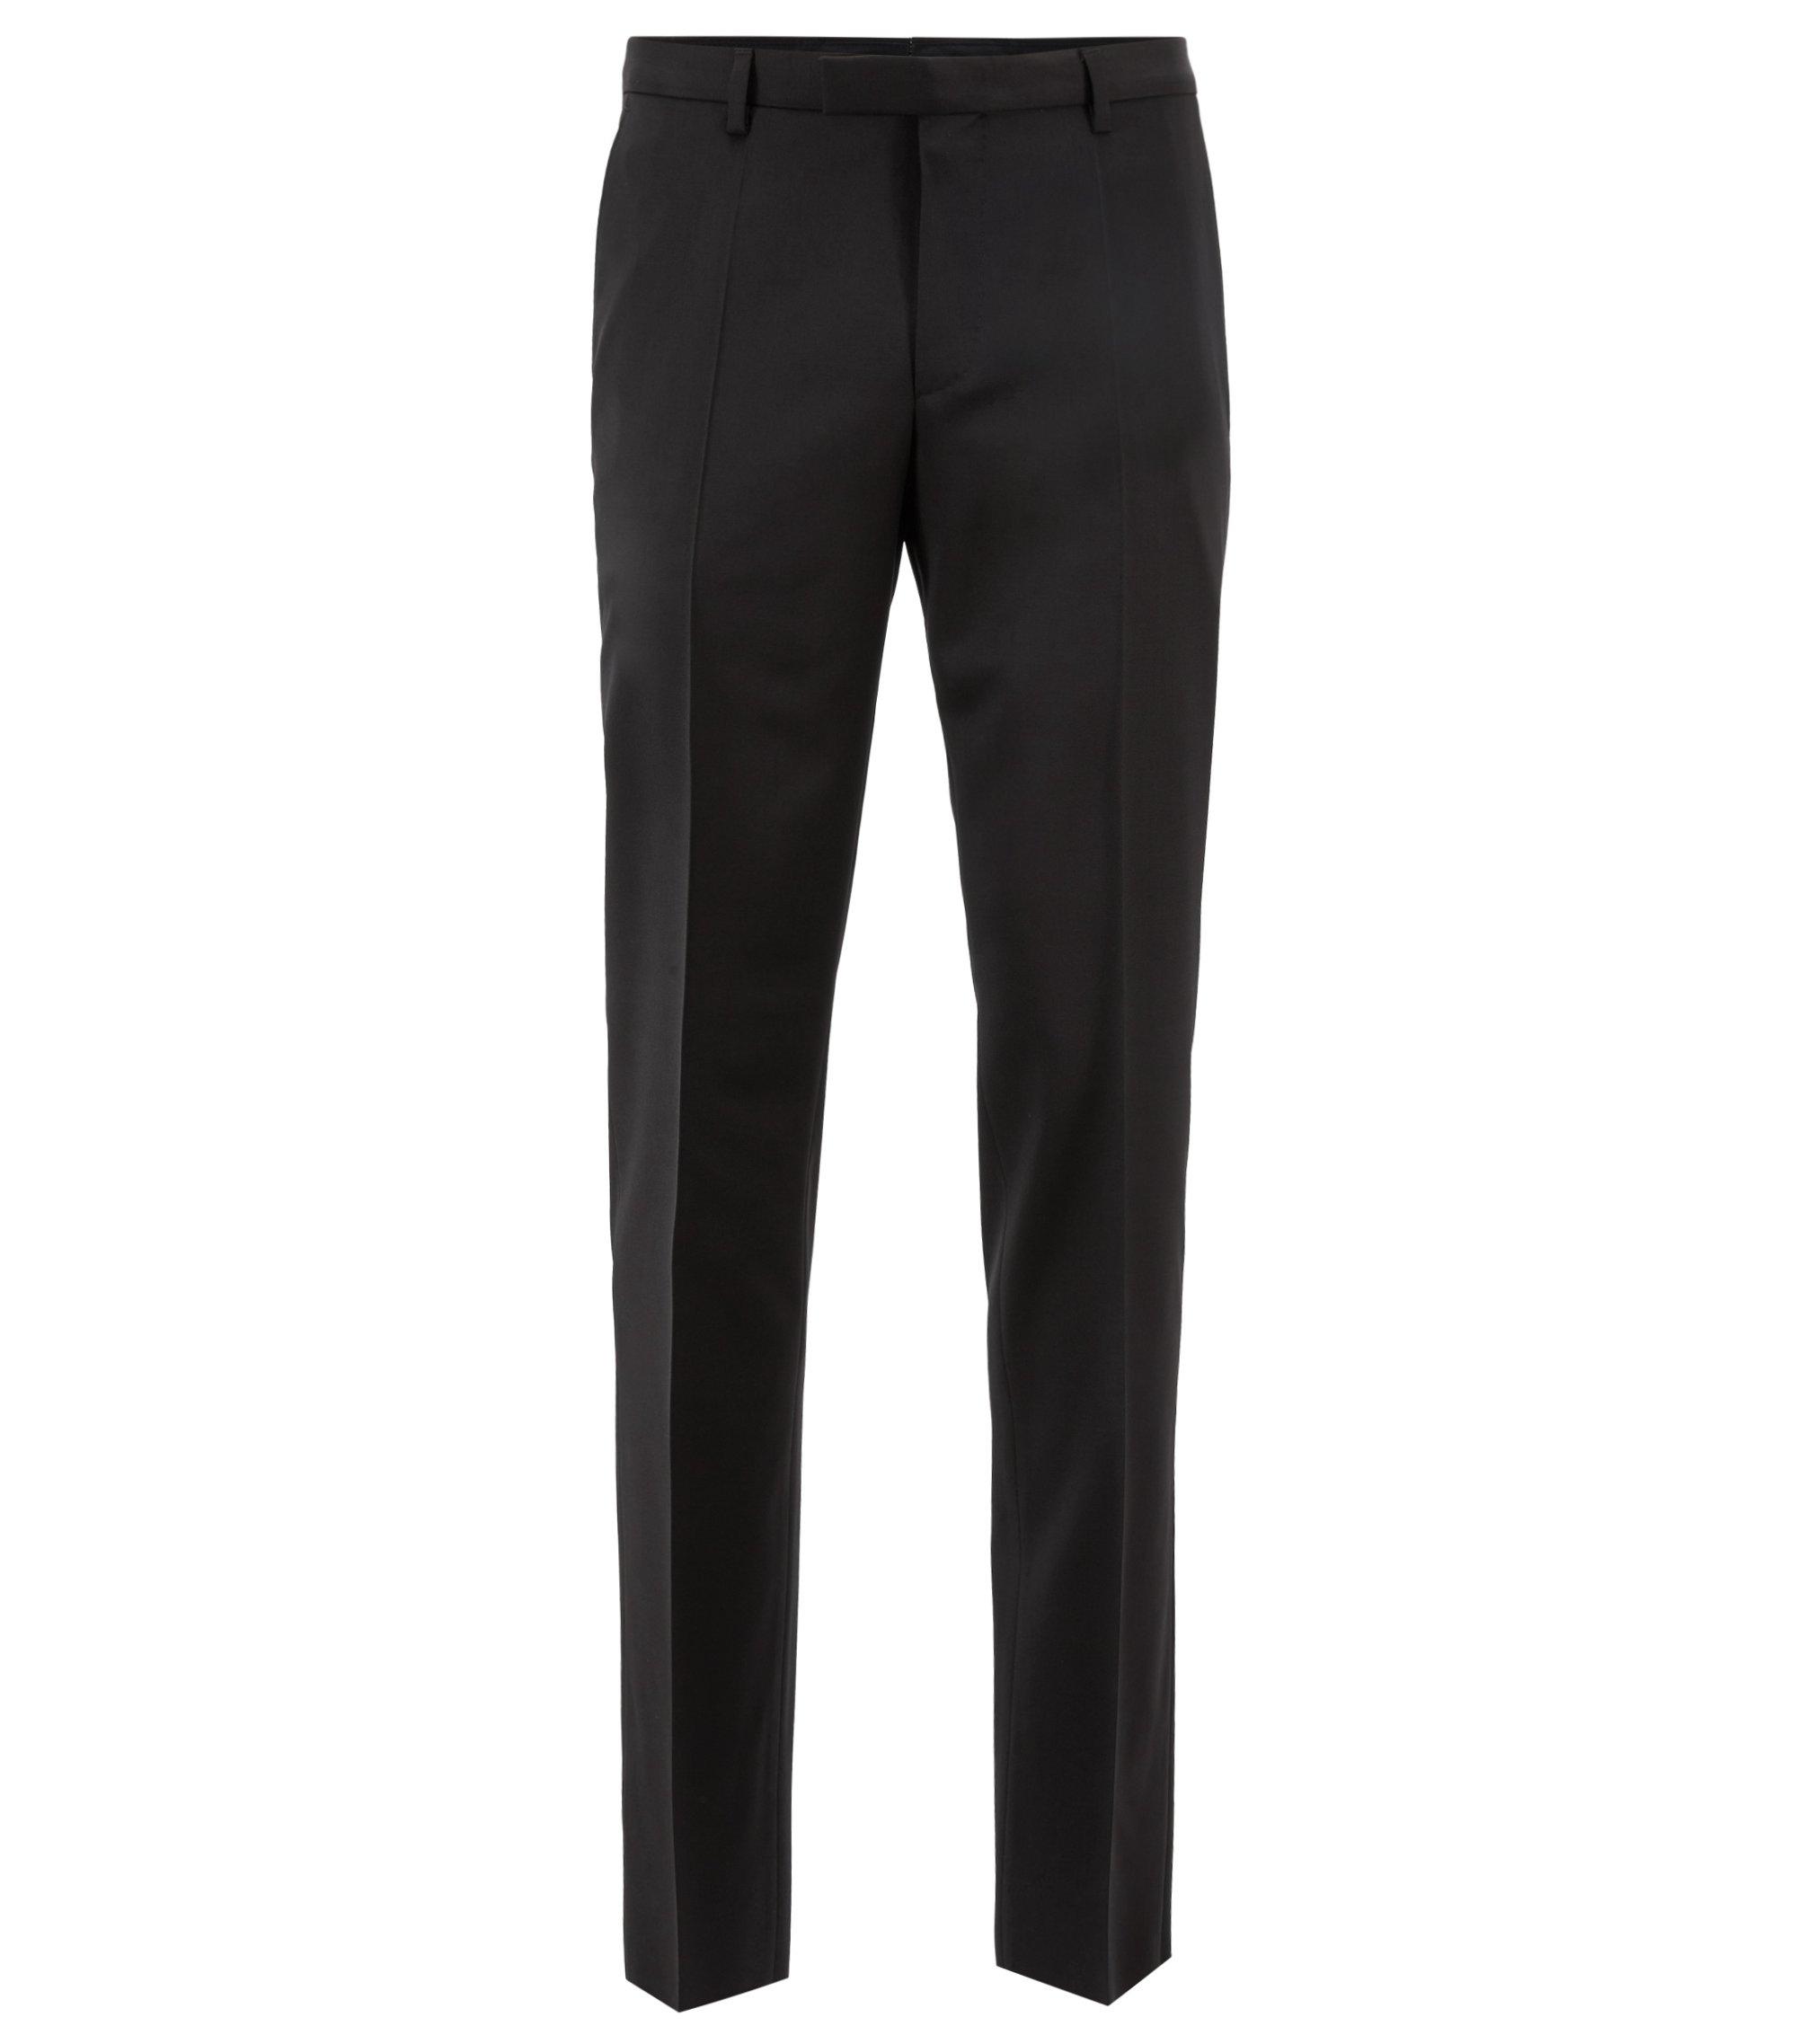 Virgin Wool Dress Pants, Regular Fit | Lenon CYL, Black